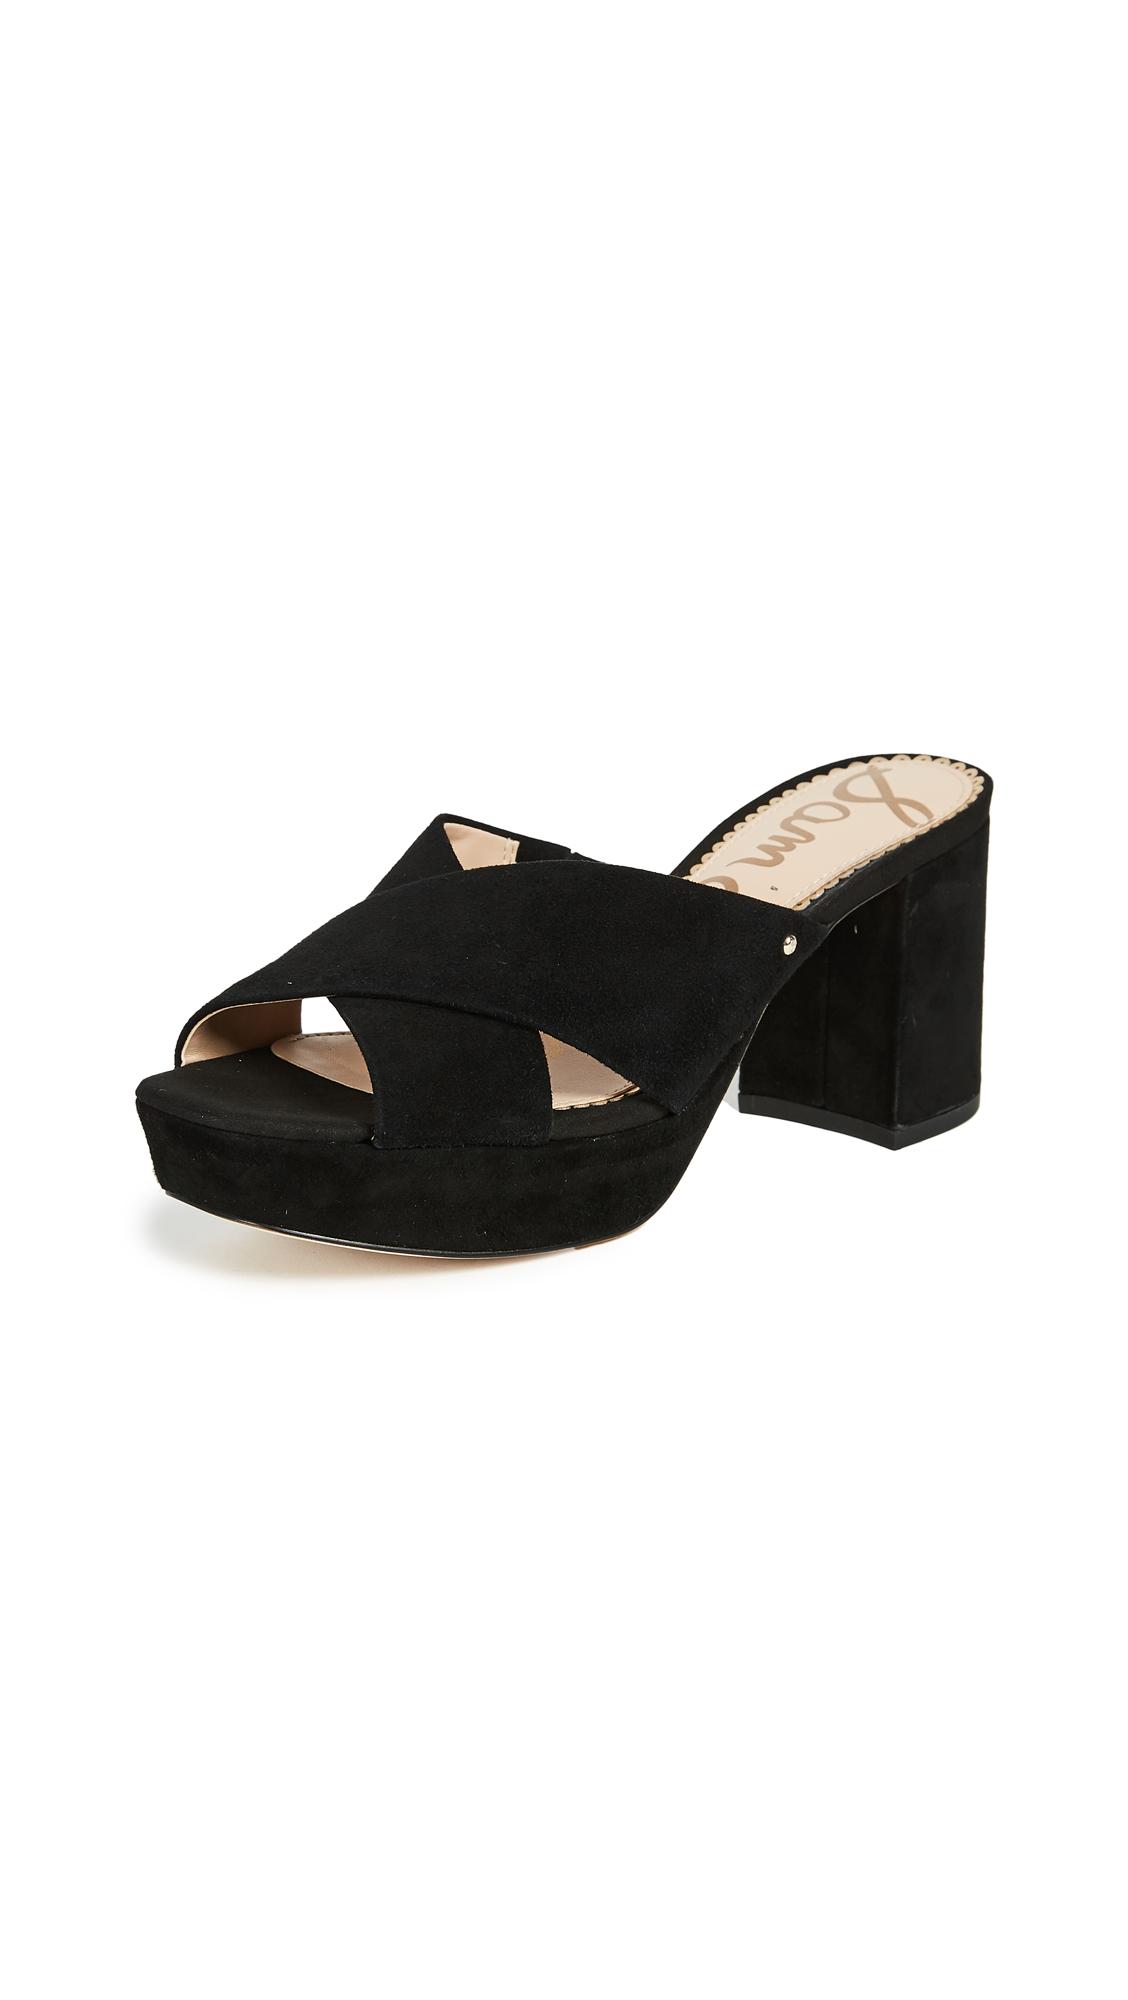 Sam Edelman Jayne Platform Mules - Black